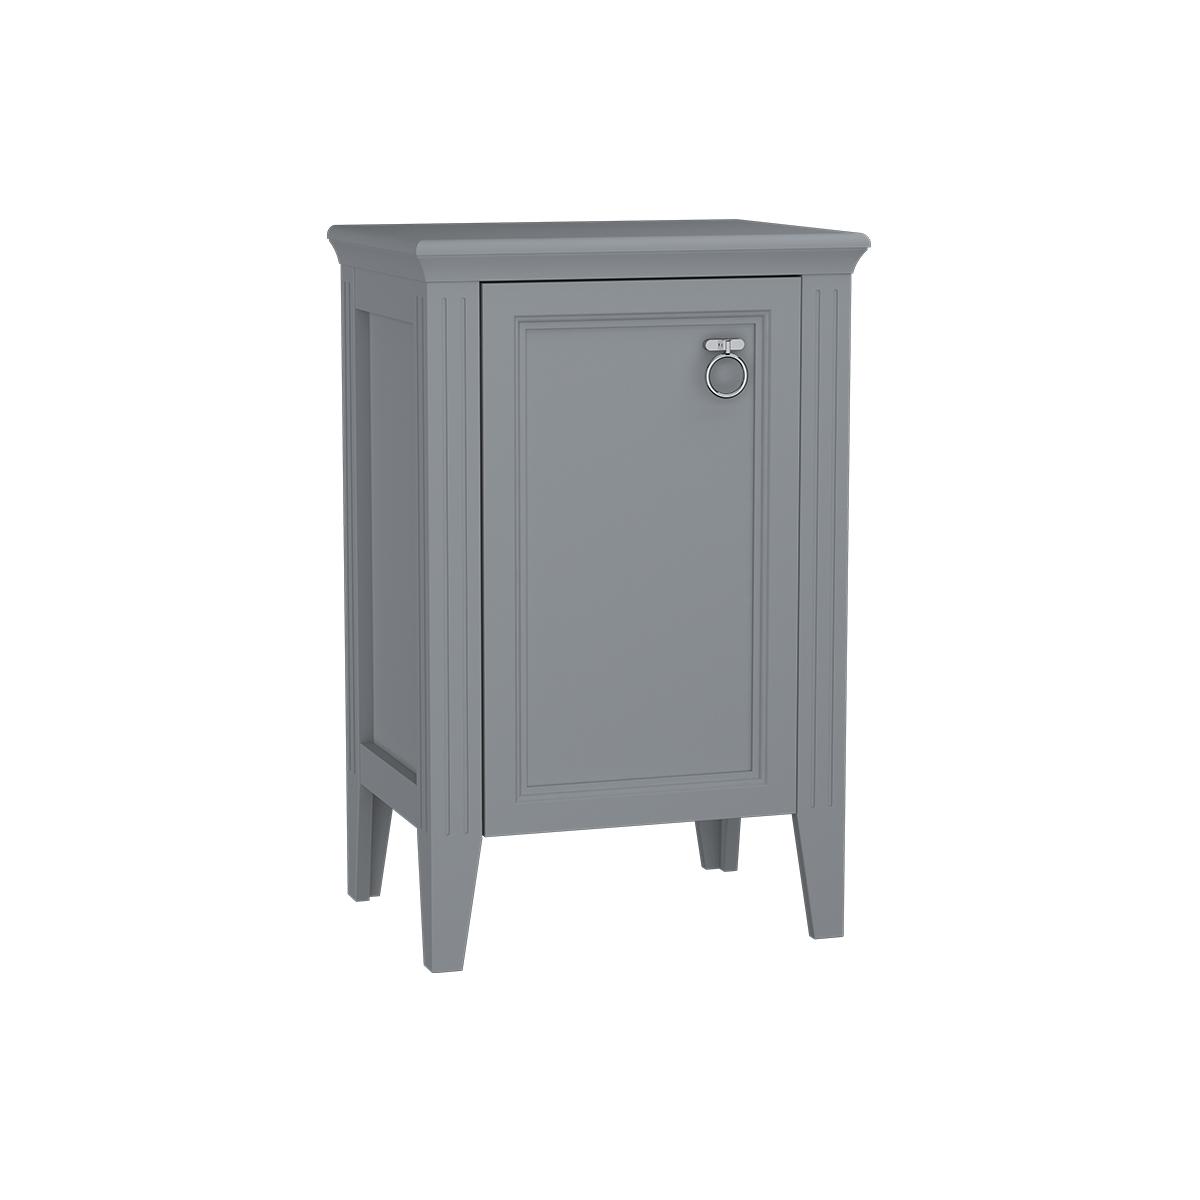 Valarte armoire mi-haute, 55 cm, porte à gauche, gris mat